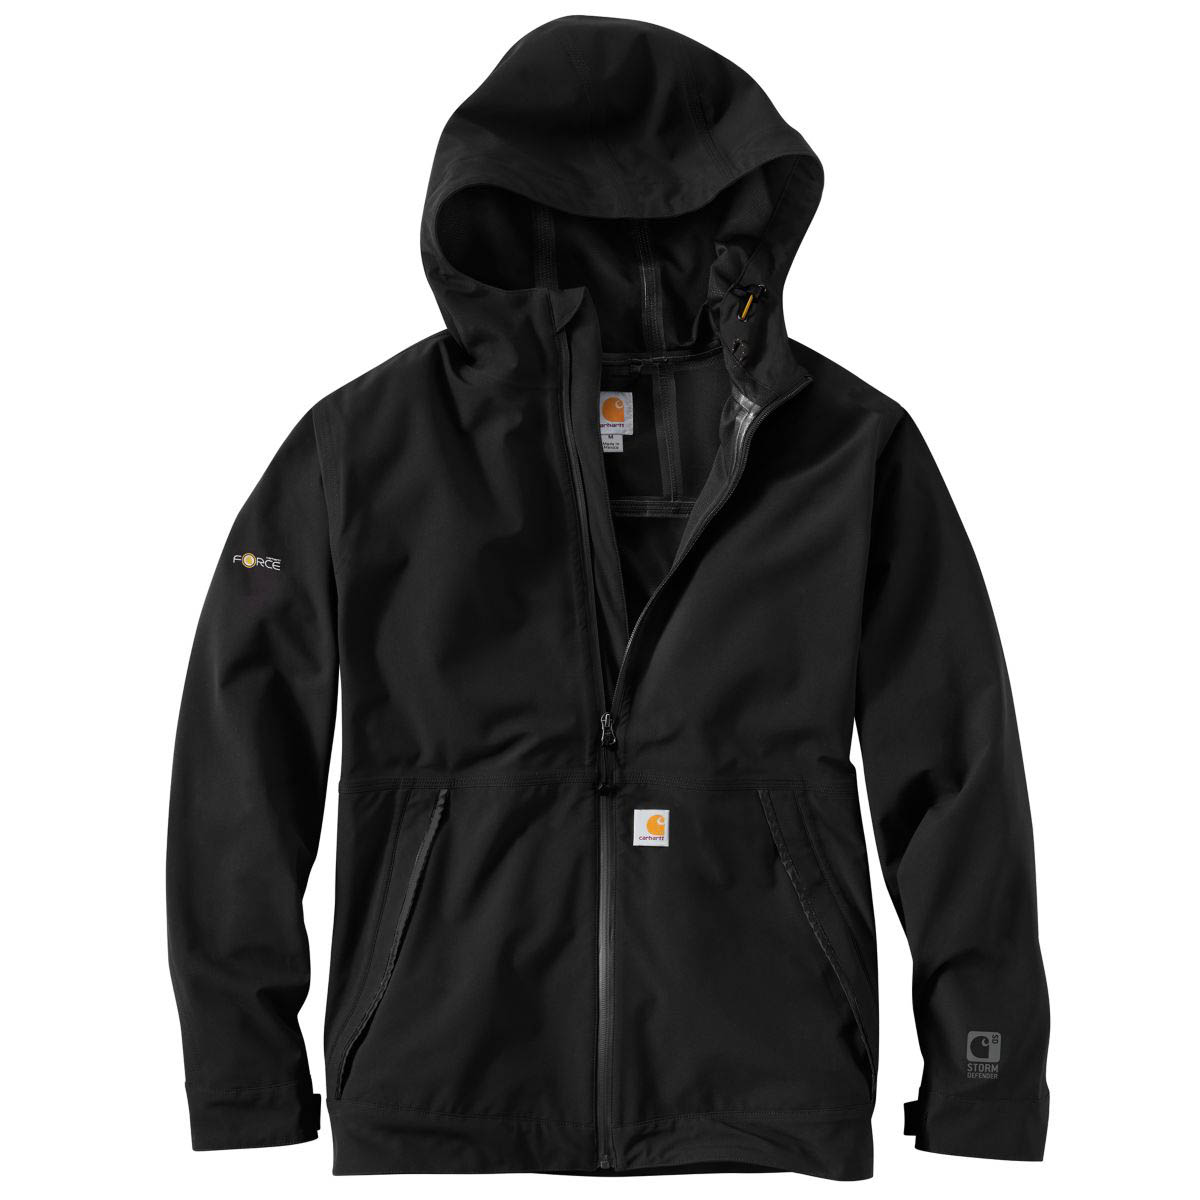 Carhartt Men's Force Equator Jacket